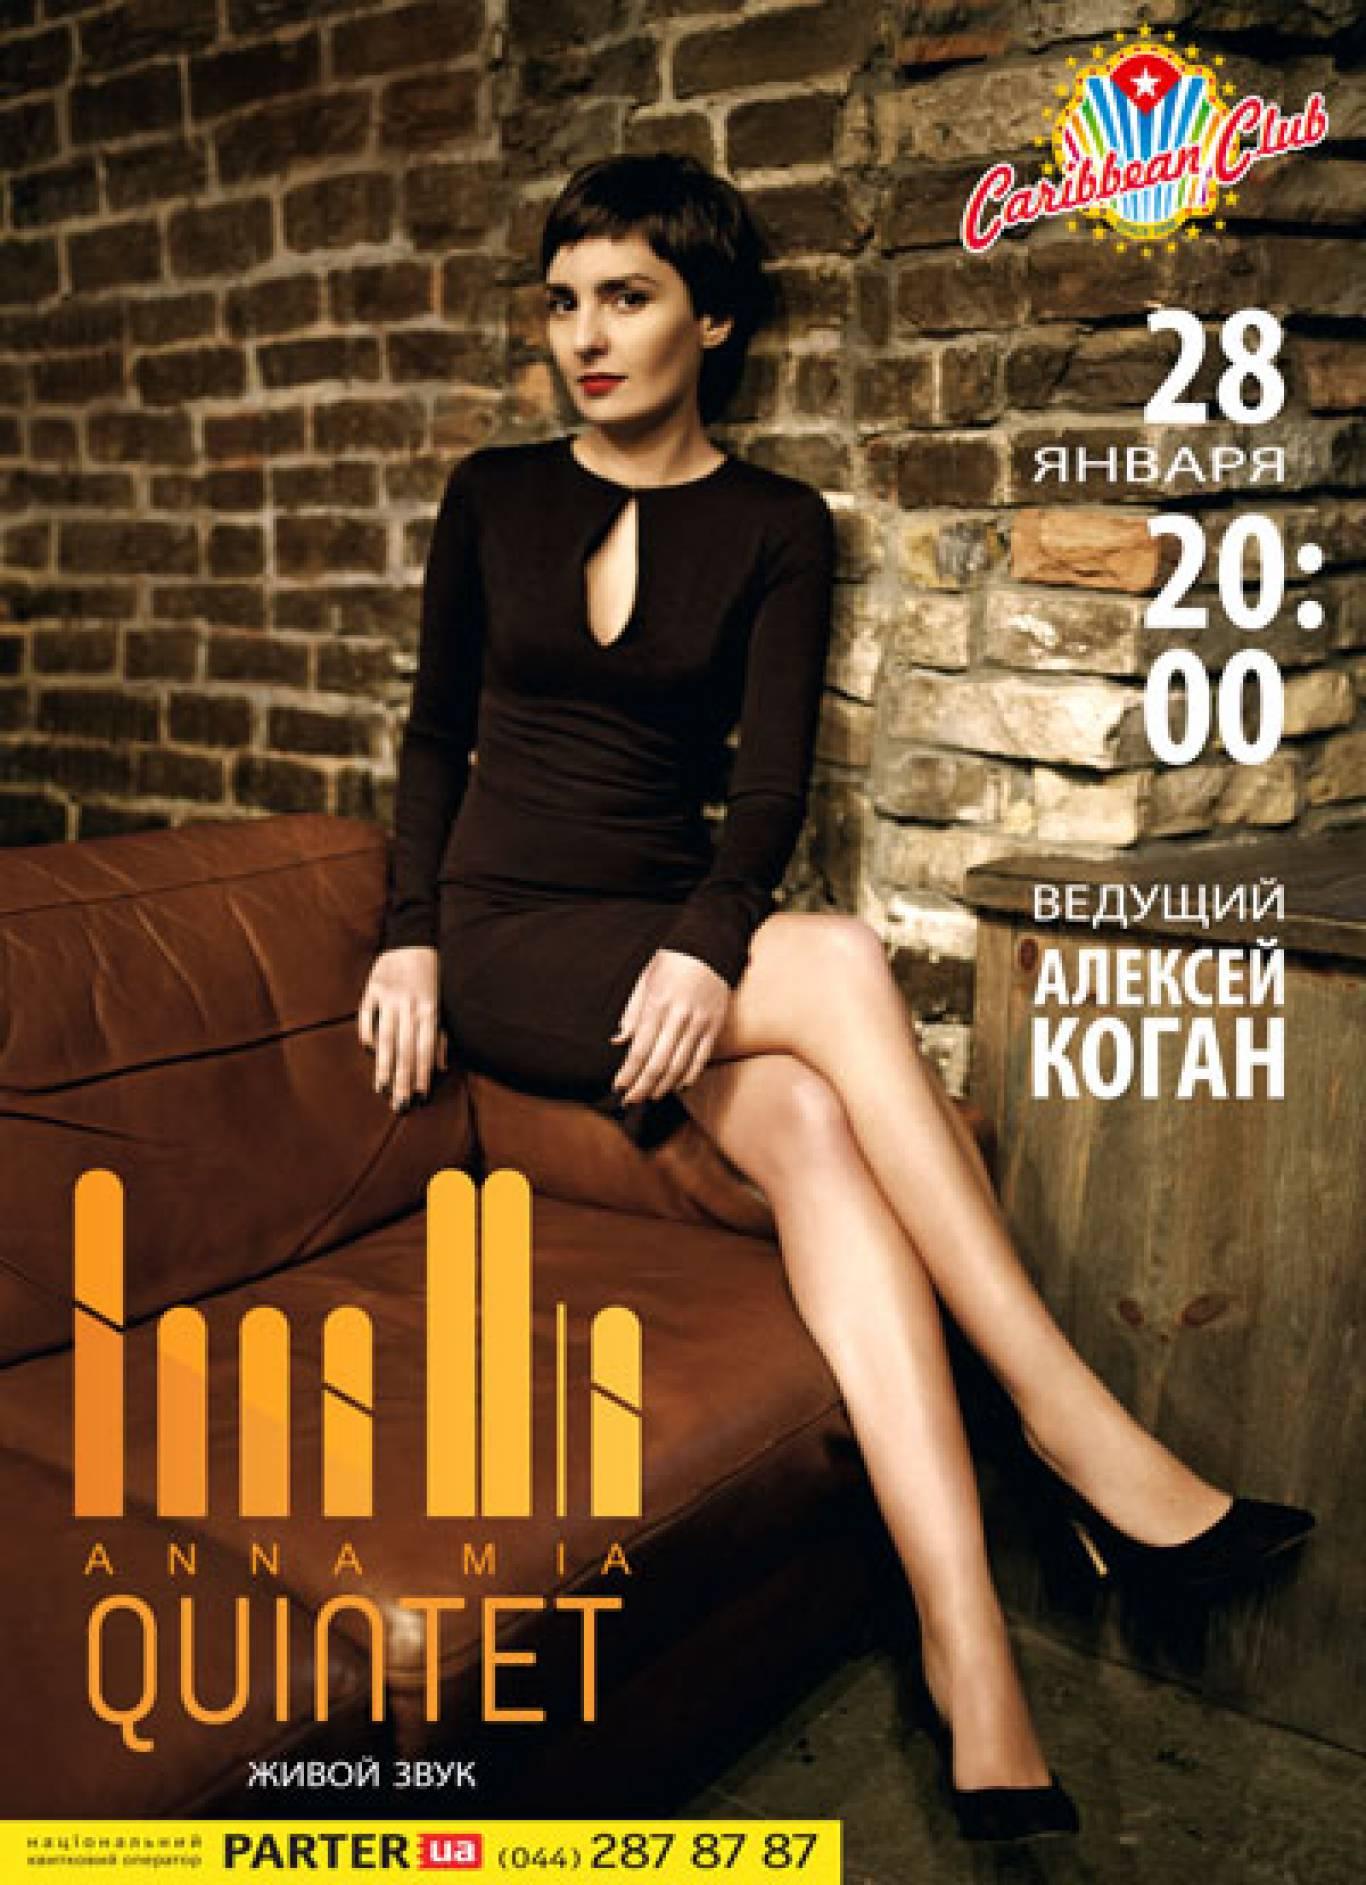 Концерт Anna Mia Quintet в Caribbean Club